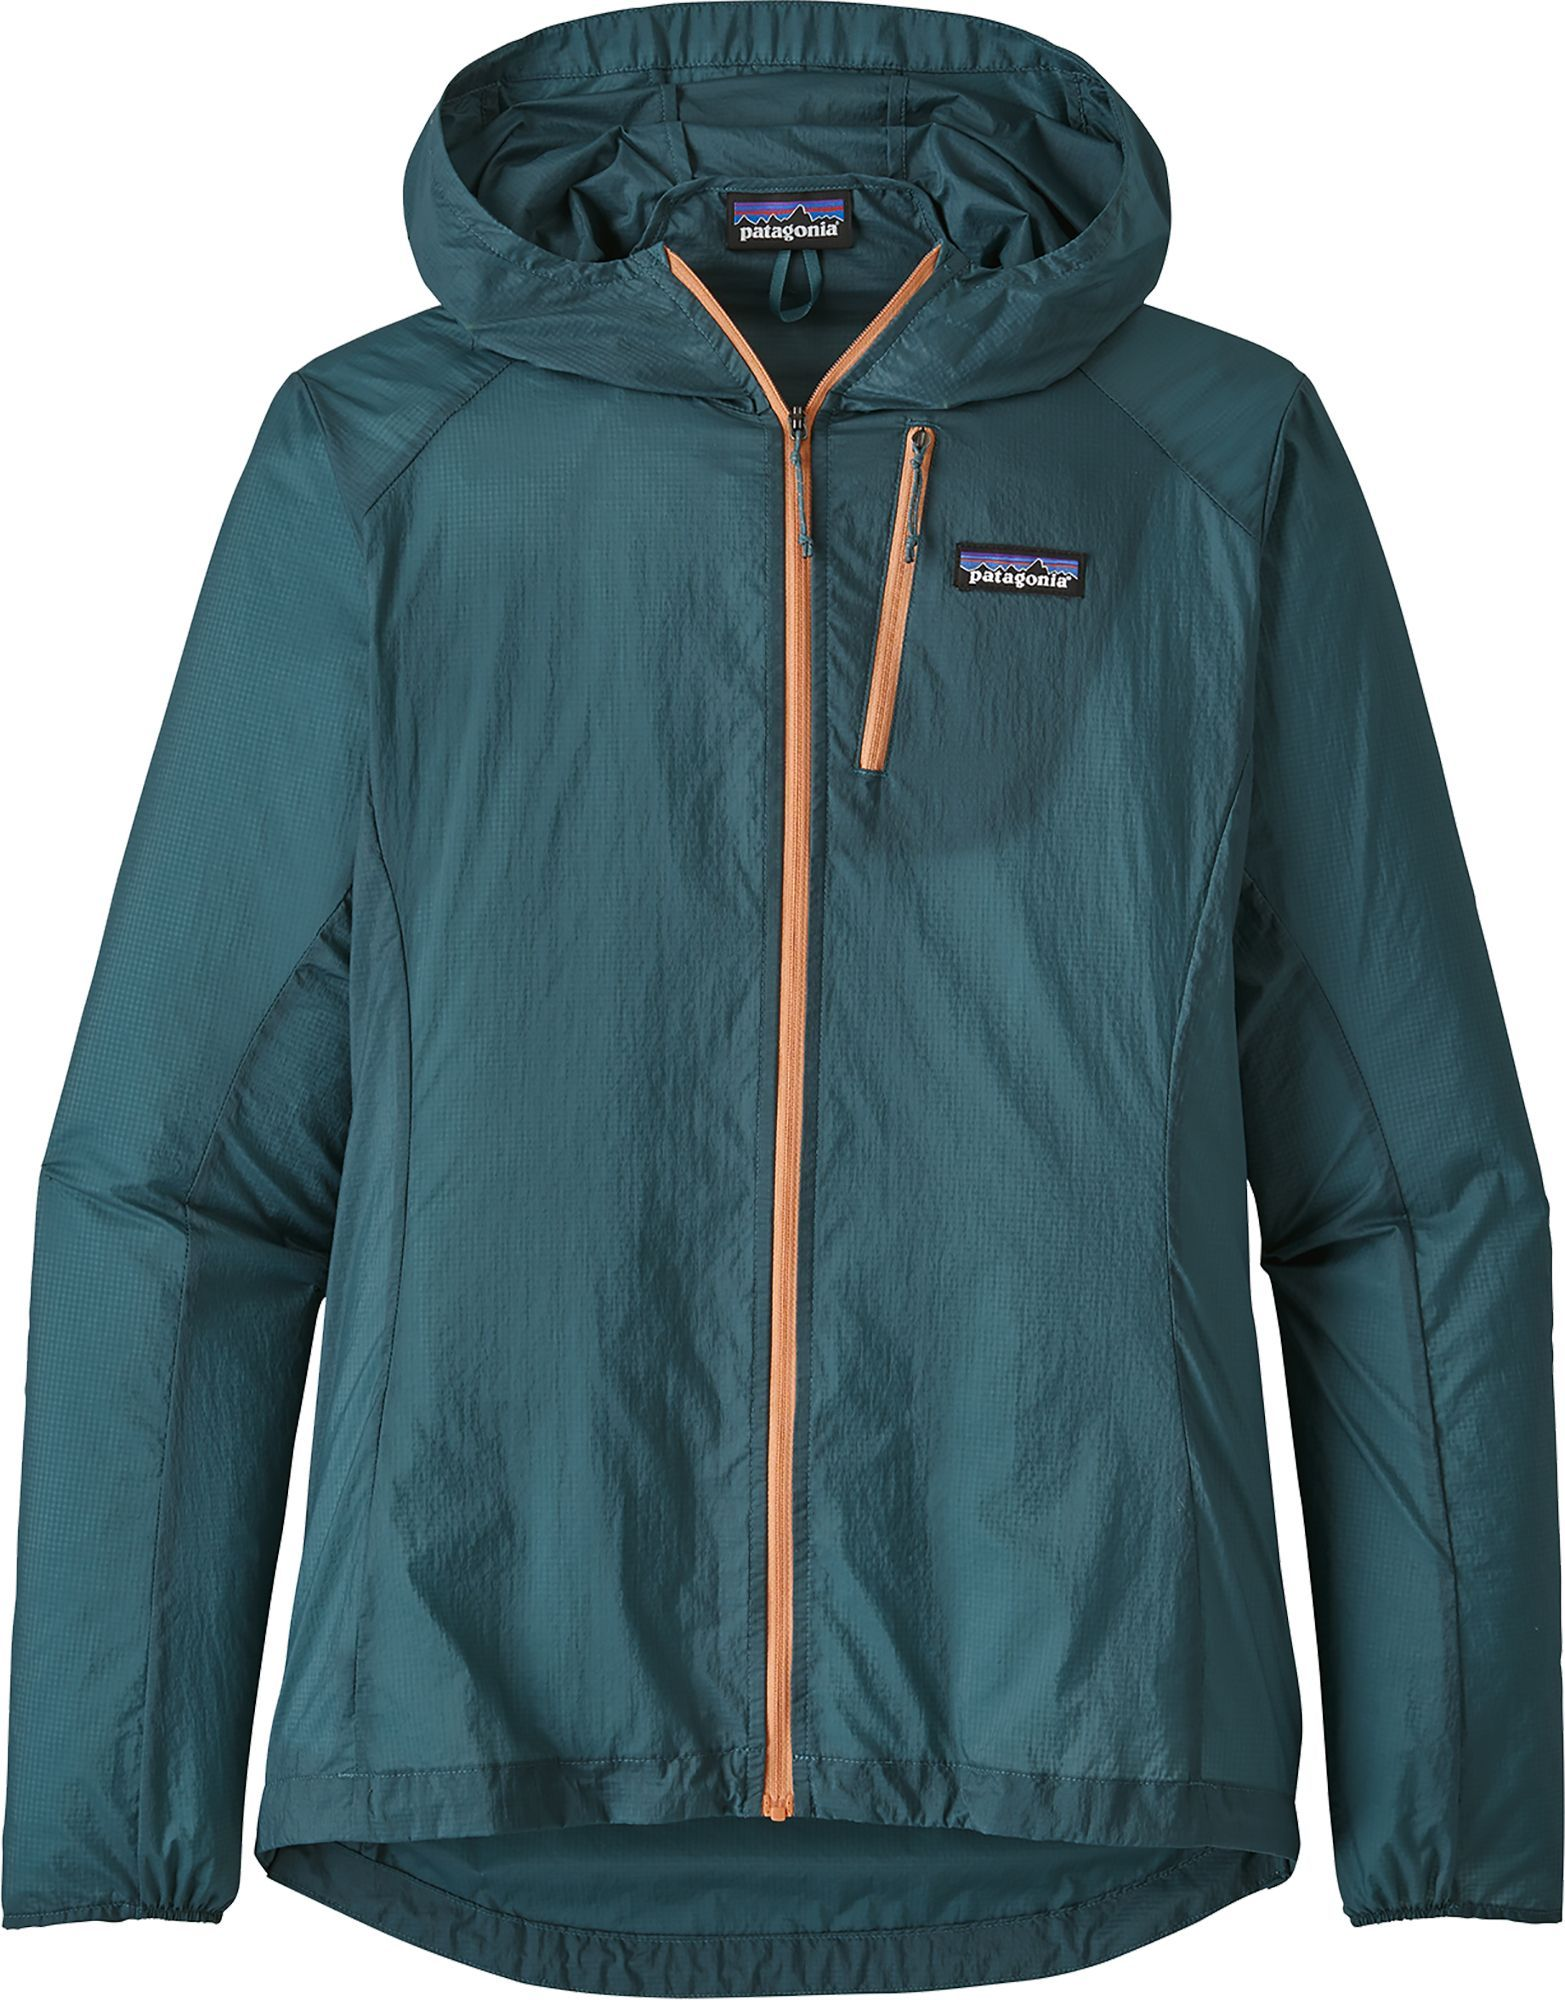 Patagonia Women's Houdini Jacket Windbreaker jacket